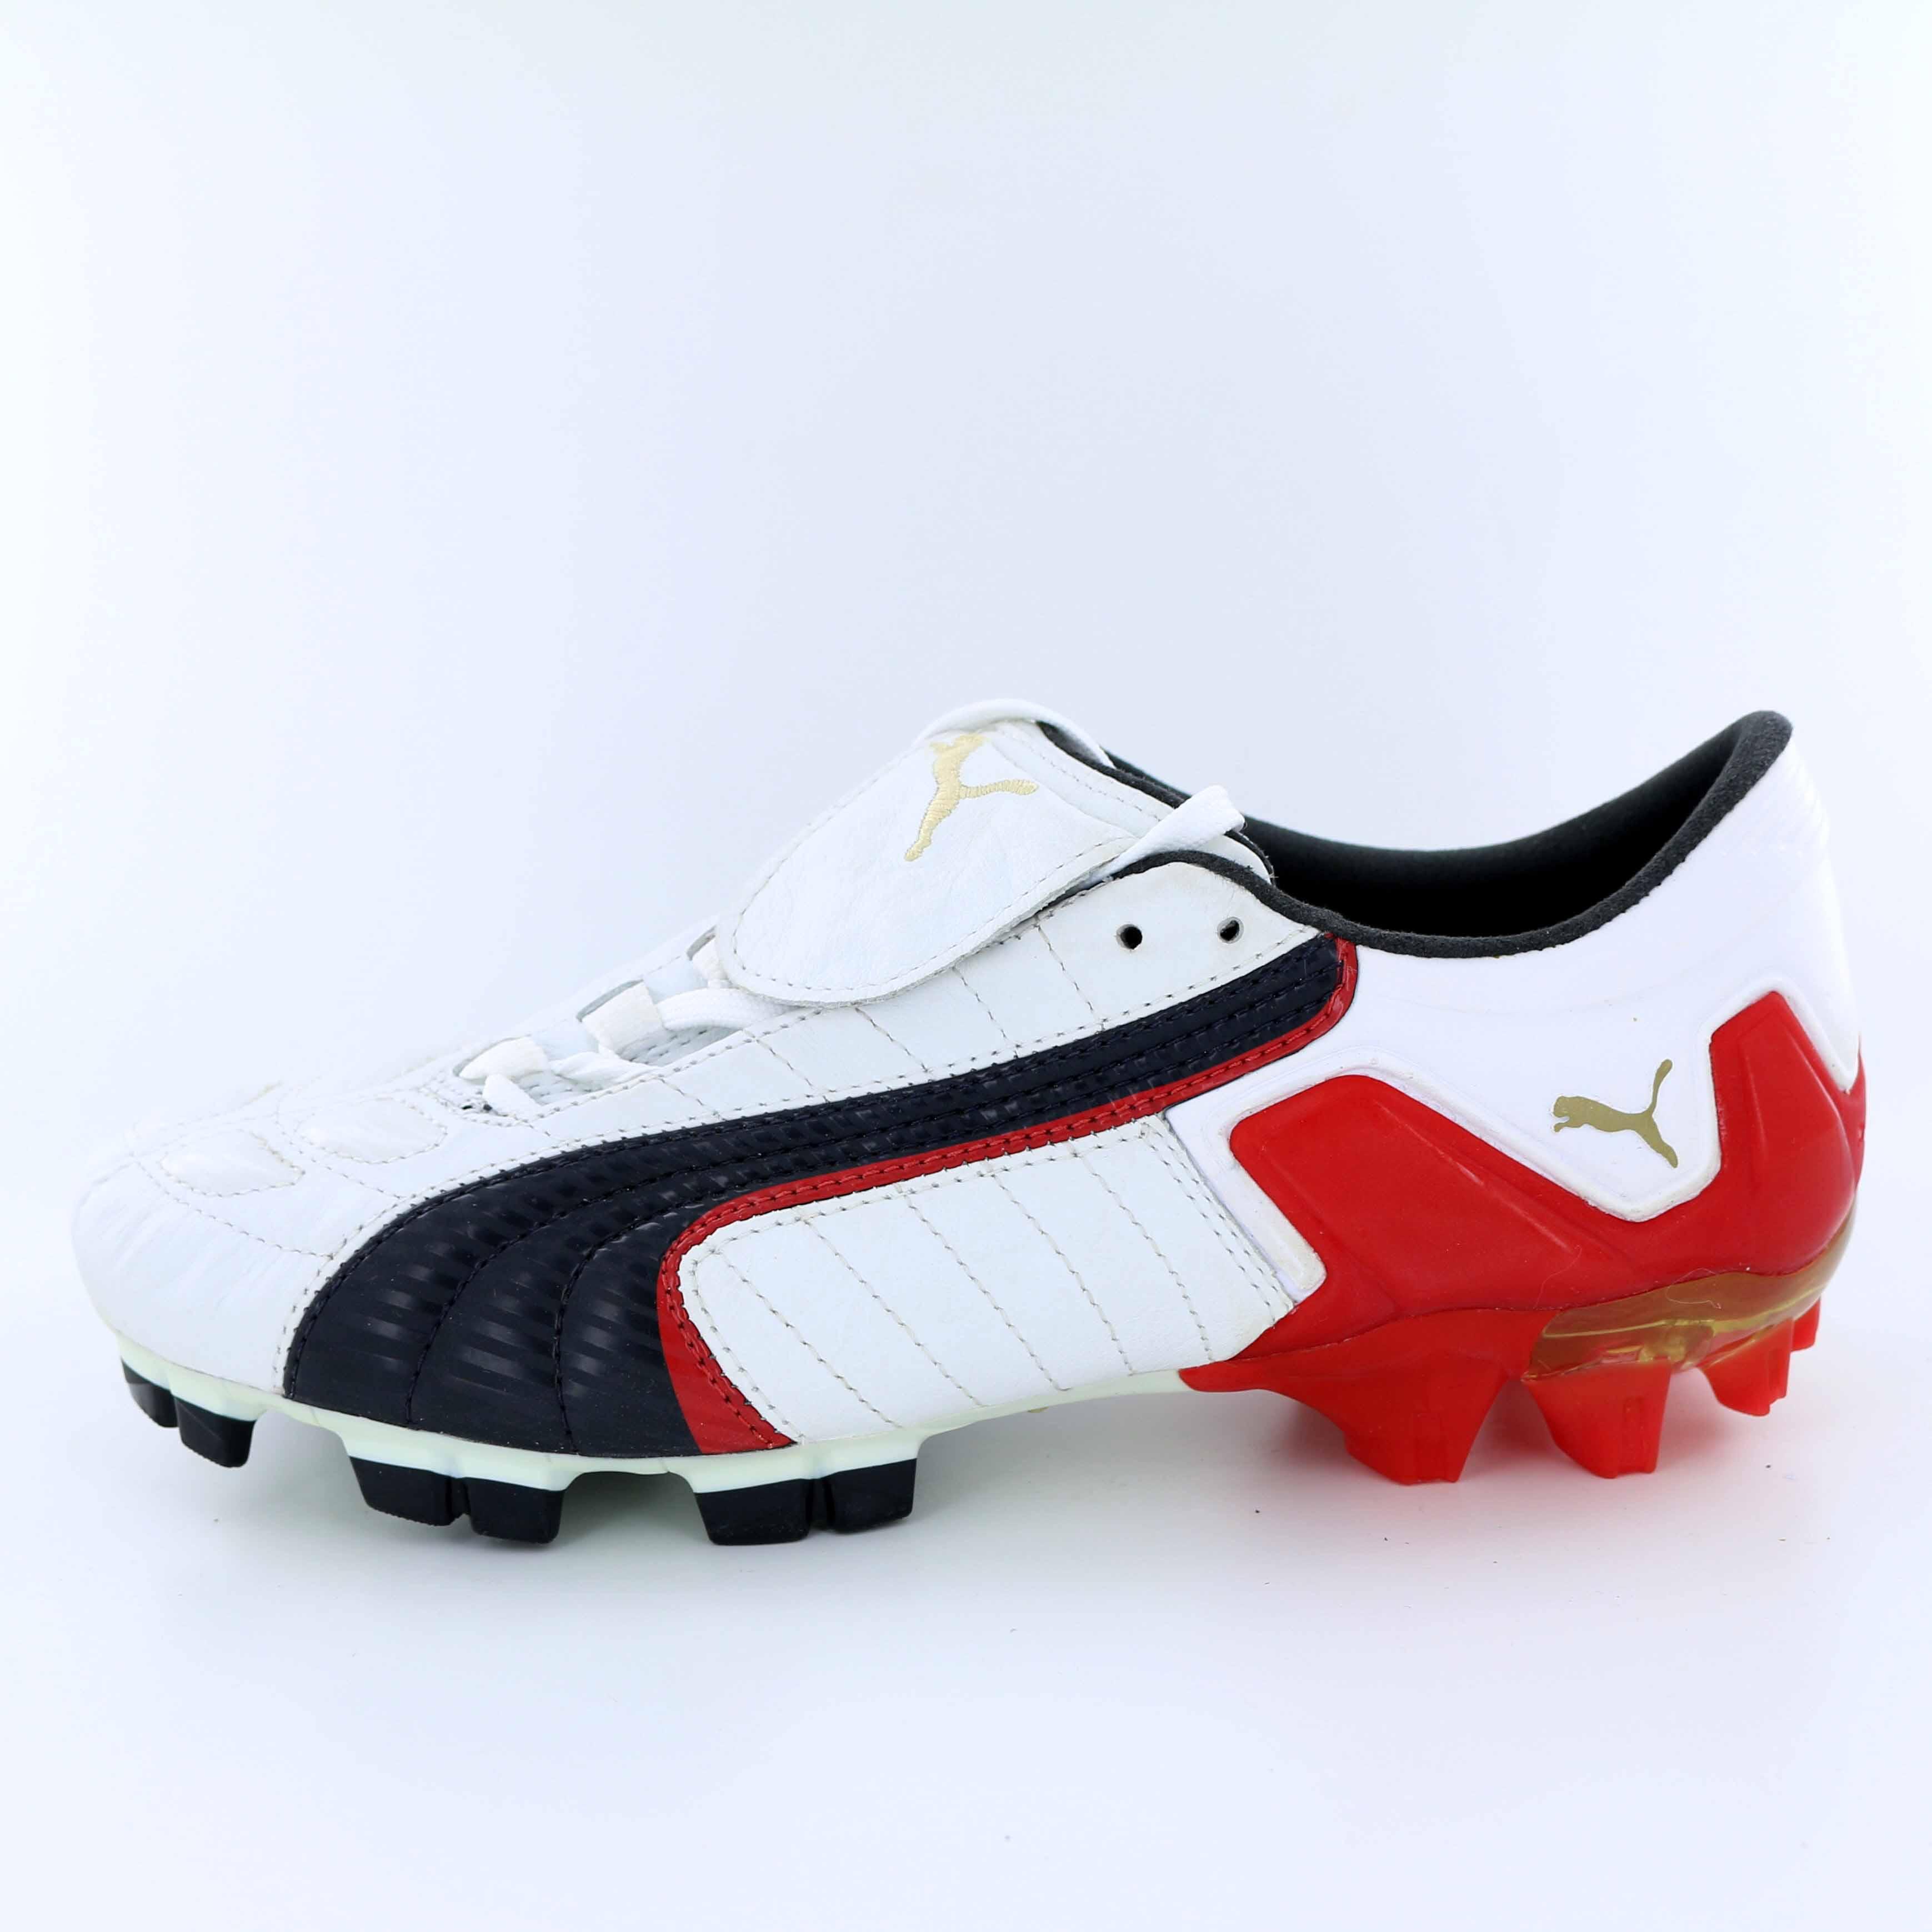 8092a5563 Puma V-Konstrukt II GCi FG - Soccer Premier